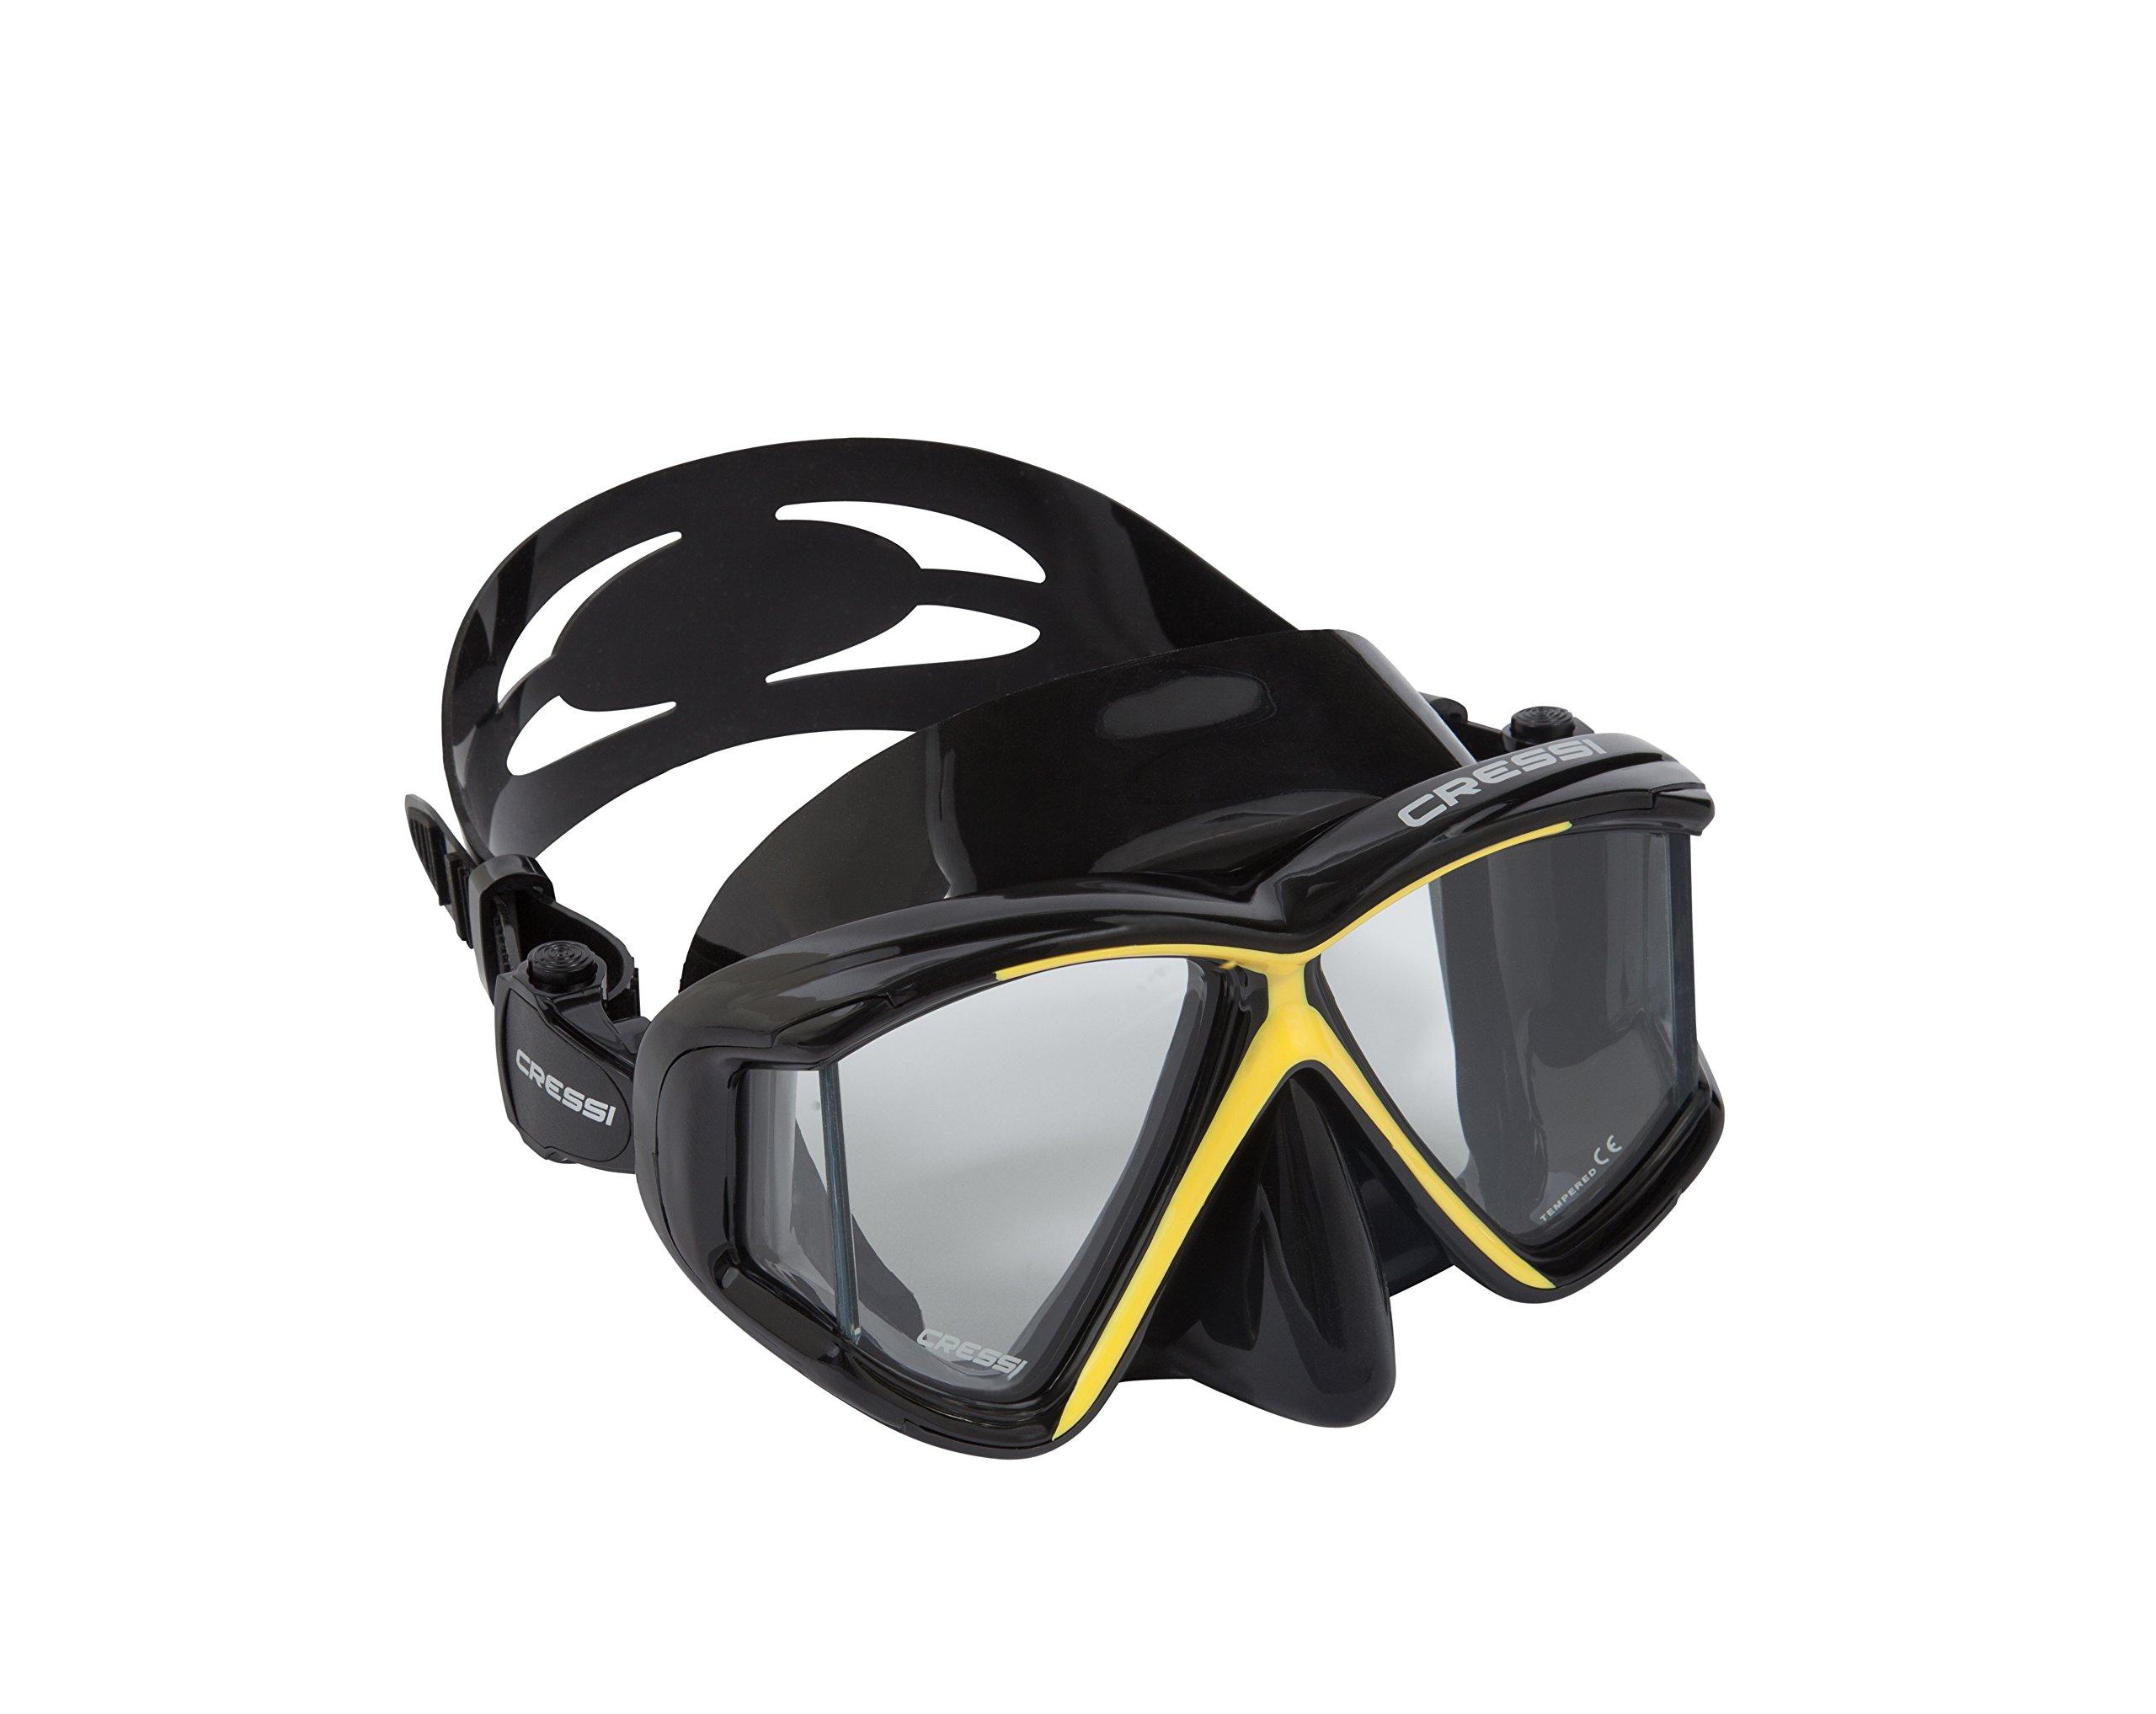 Cressi Panoramic 4 Window Dive Mask - Black/Yellow by Cressi